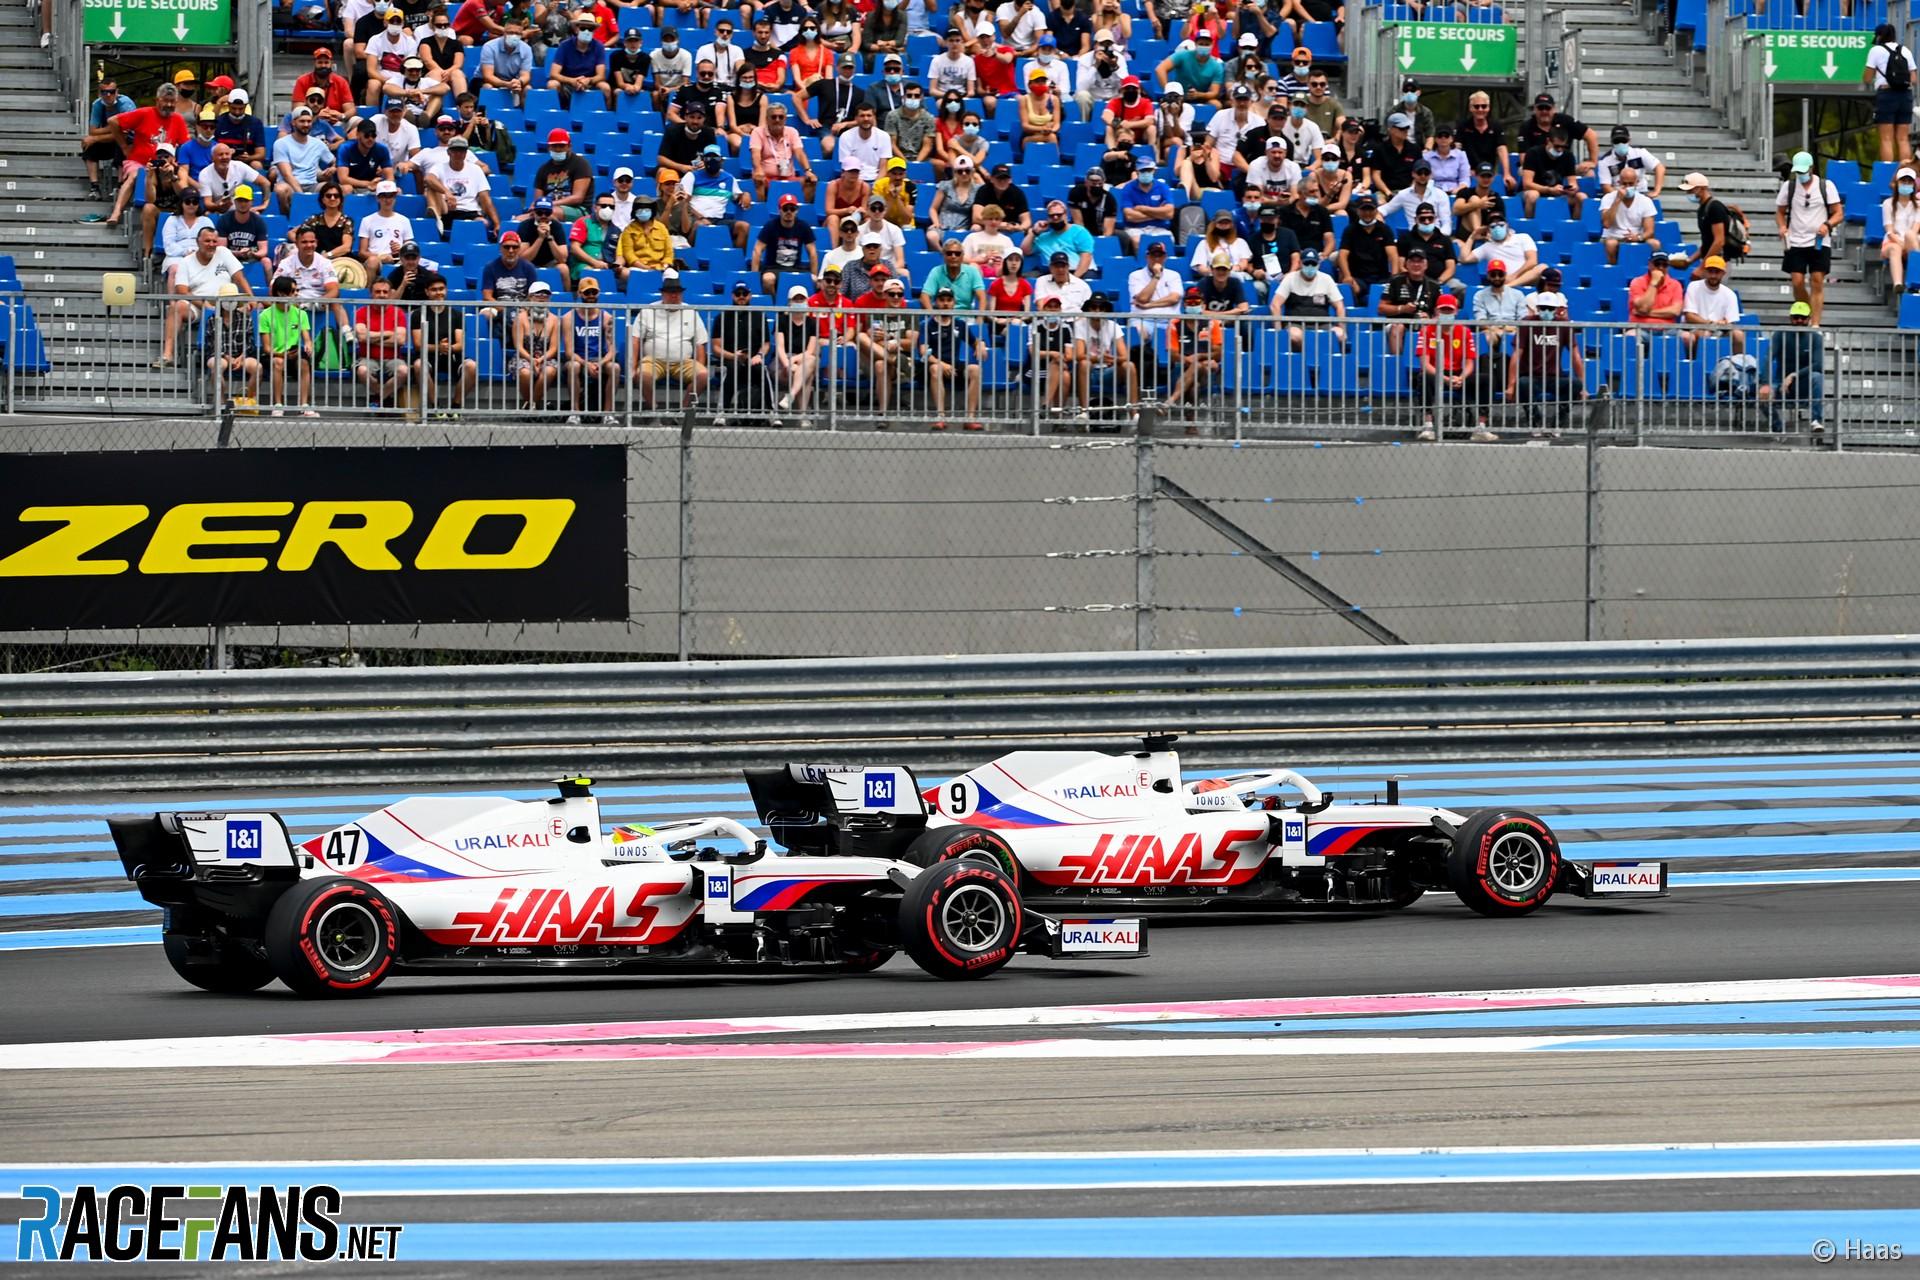 Nikita Mazepin and Mick Schumacher, Haas F1 Team, VF21